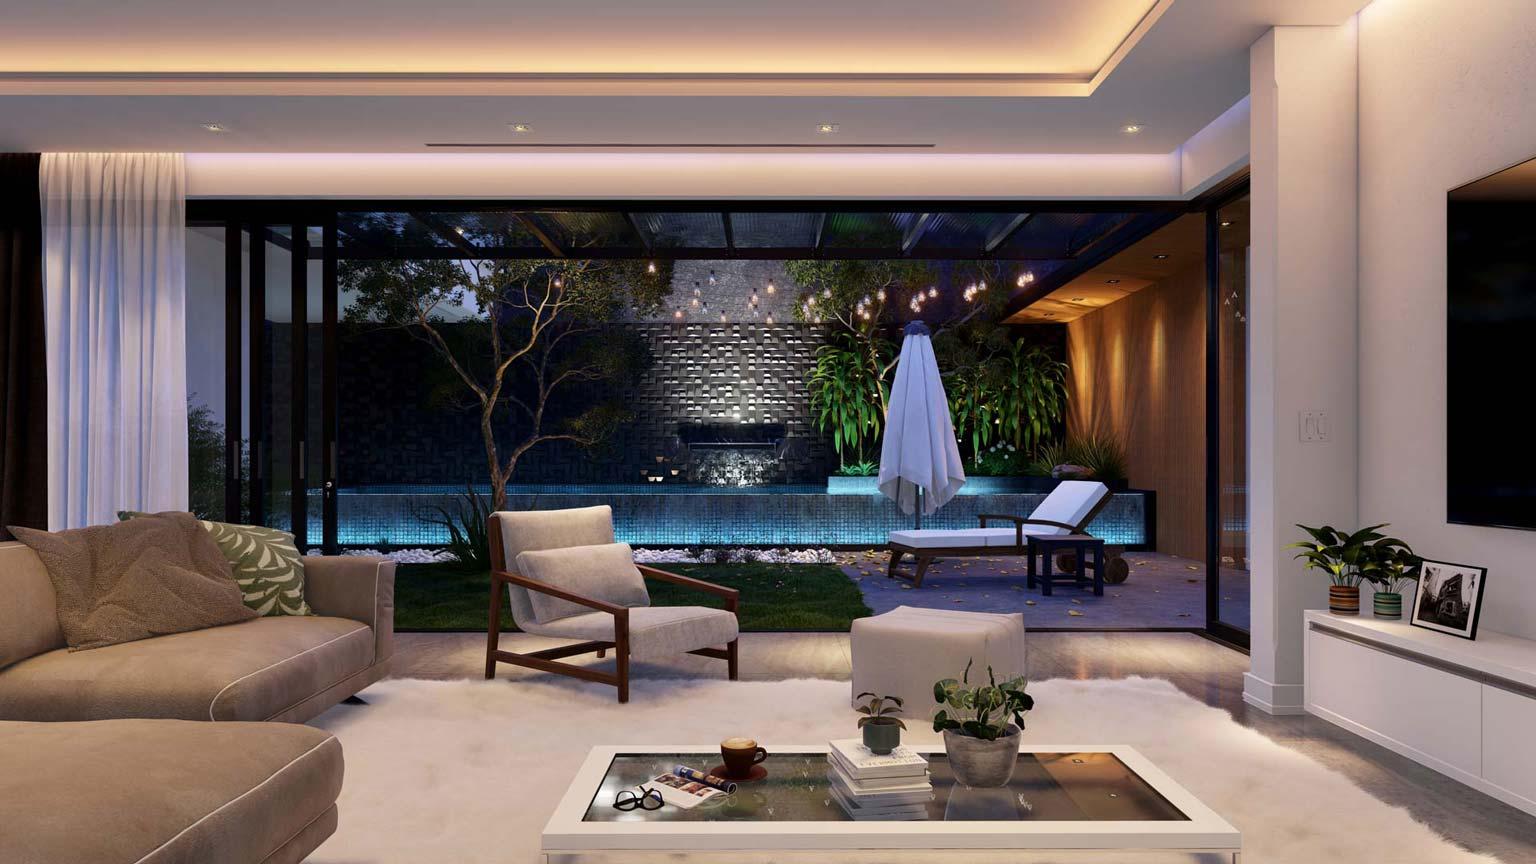 Residential-interior-1536x864_Lumion10